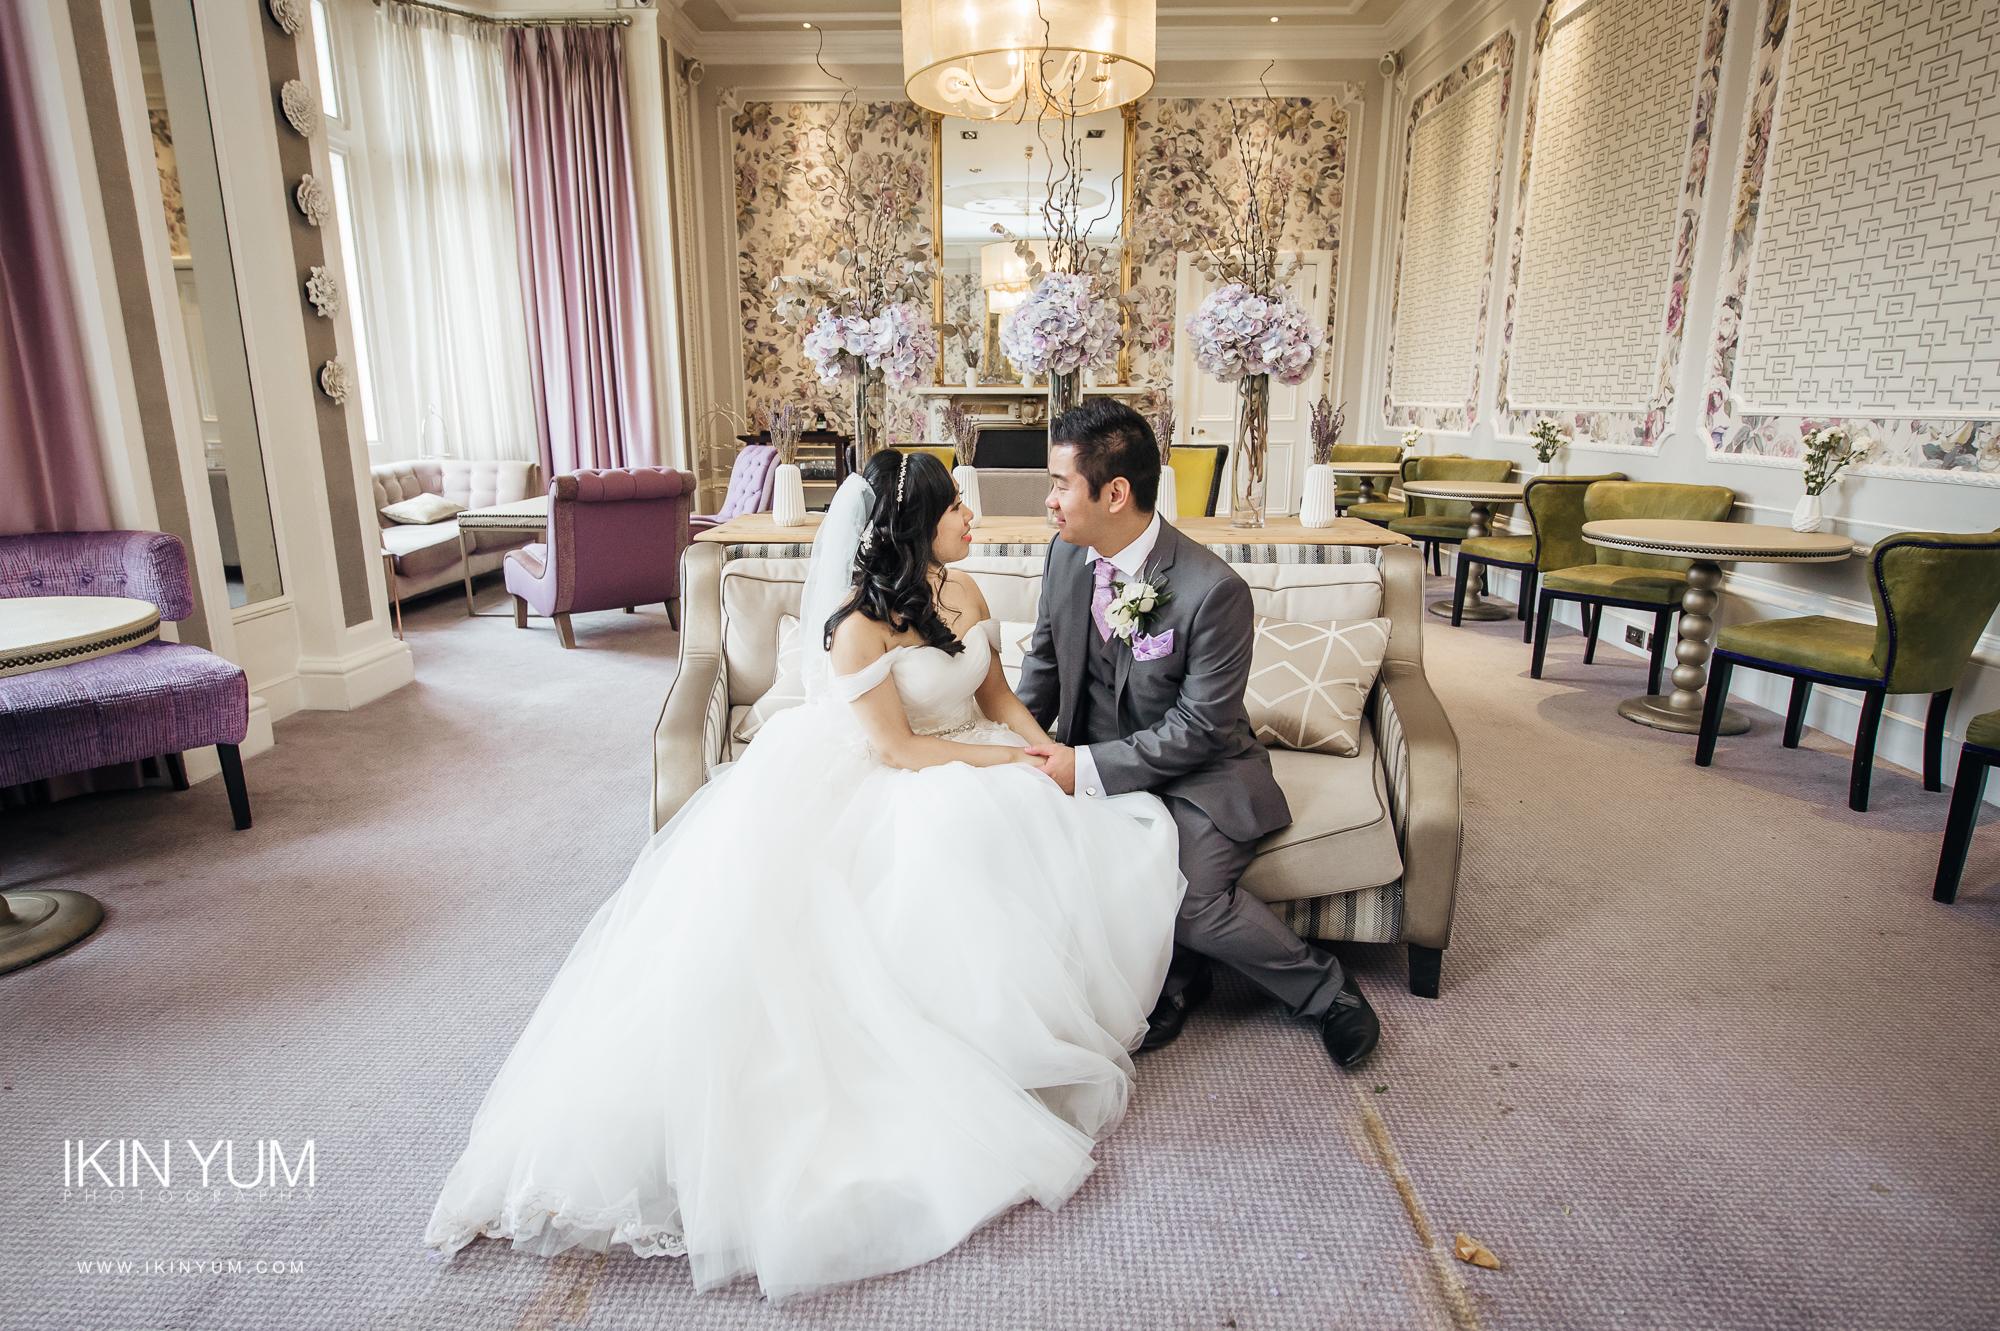 Hampton Manor Wedding - Ikin Yum Photography -120.jpg